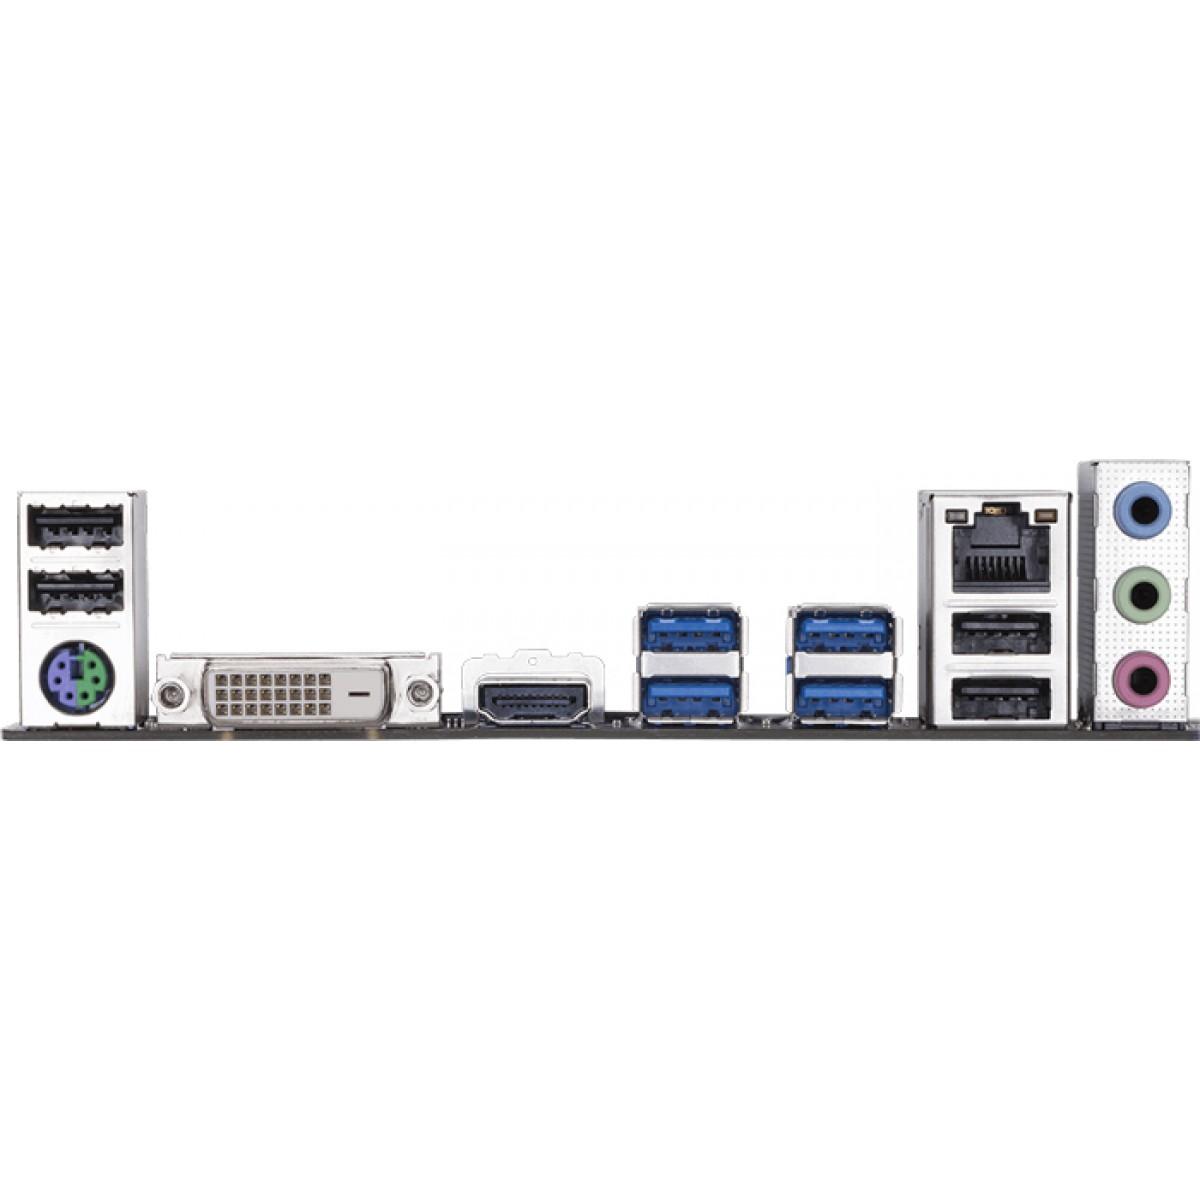 Placa Mãe Gigabyte GA-AB350M-DS3H, Chipset B350, AMD AM4, mATX, DDR4